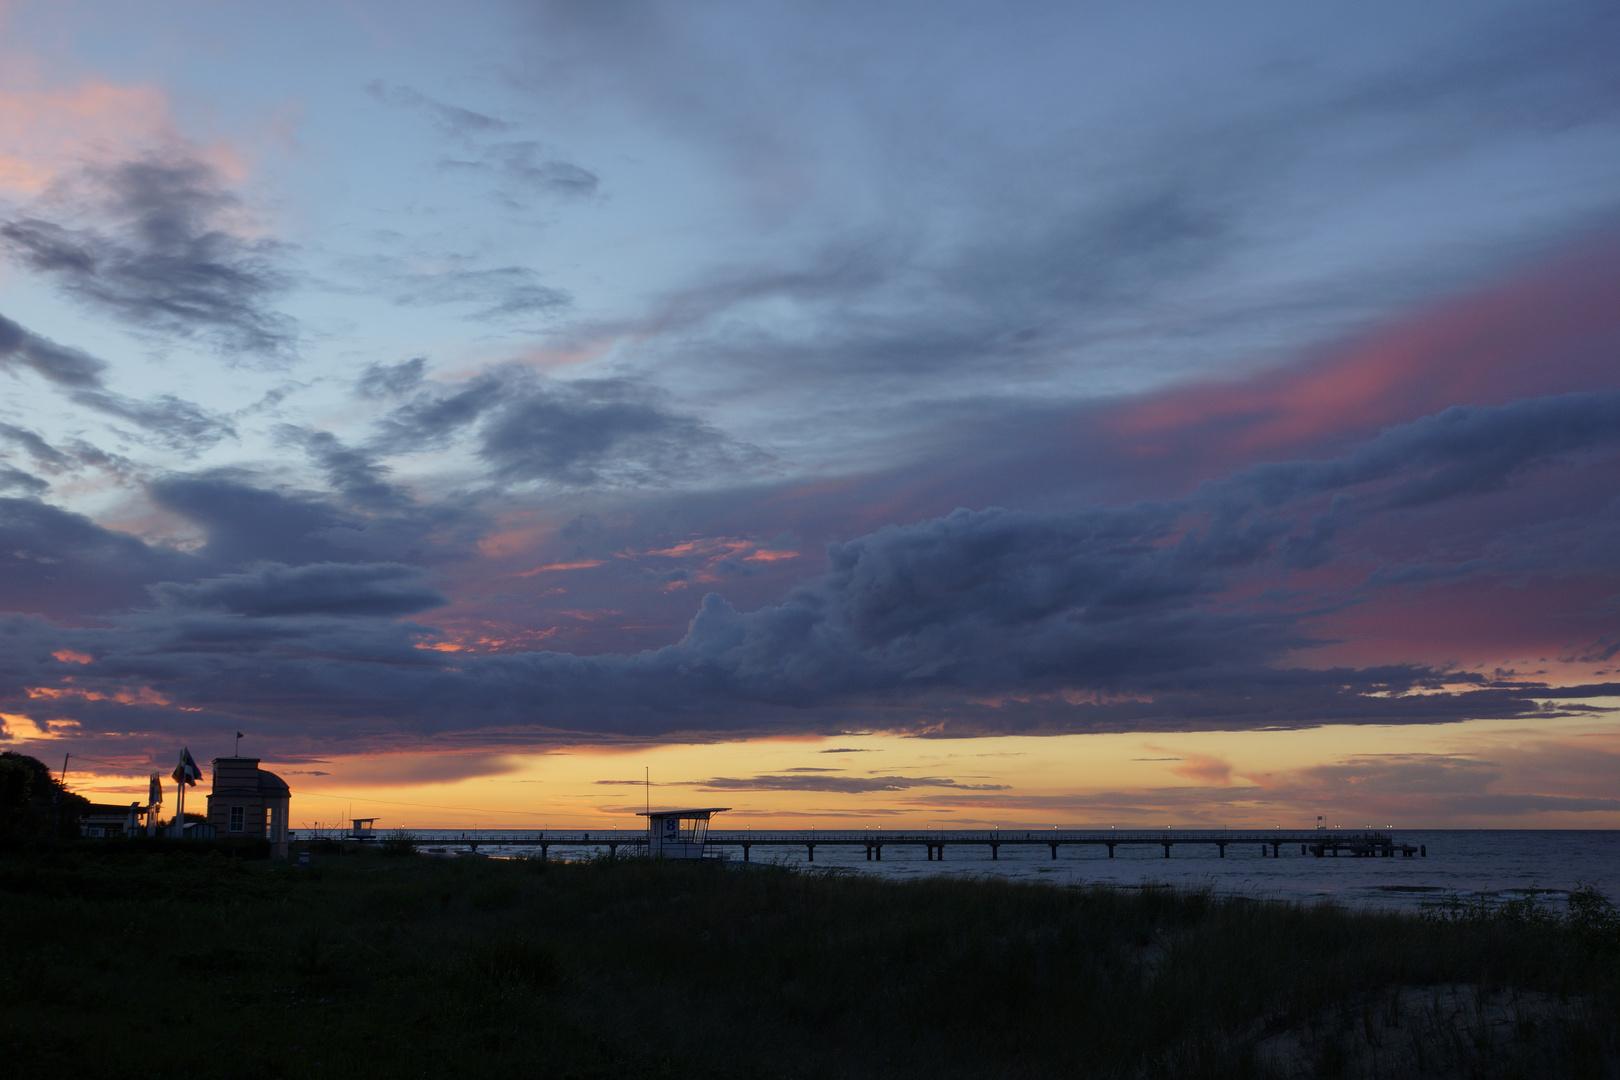 Bedrohlicher Sonnenuntergang